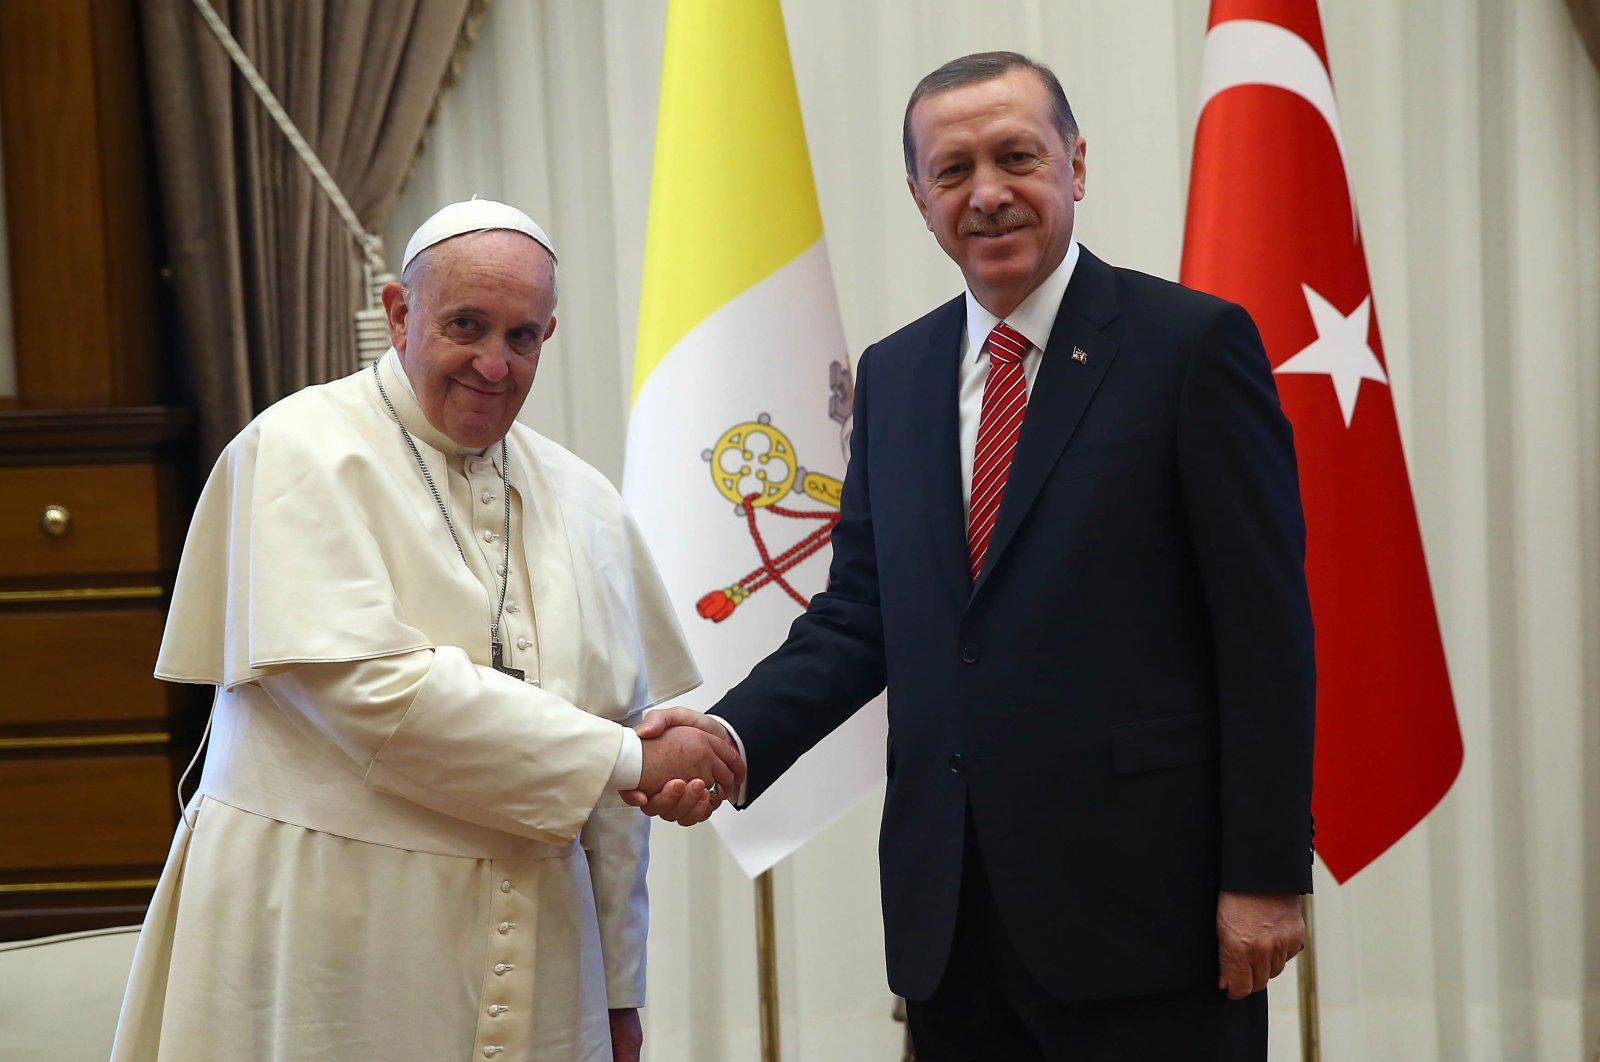 President Recep Tayyip Erdoğan (R) and Pope Francis shake hands at the Presidency in Ankara, Turkey, on Nov. 28, 2014. (Sabah Photo)